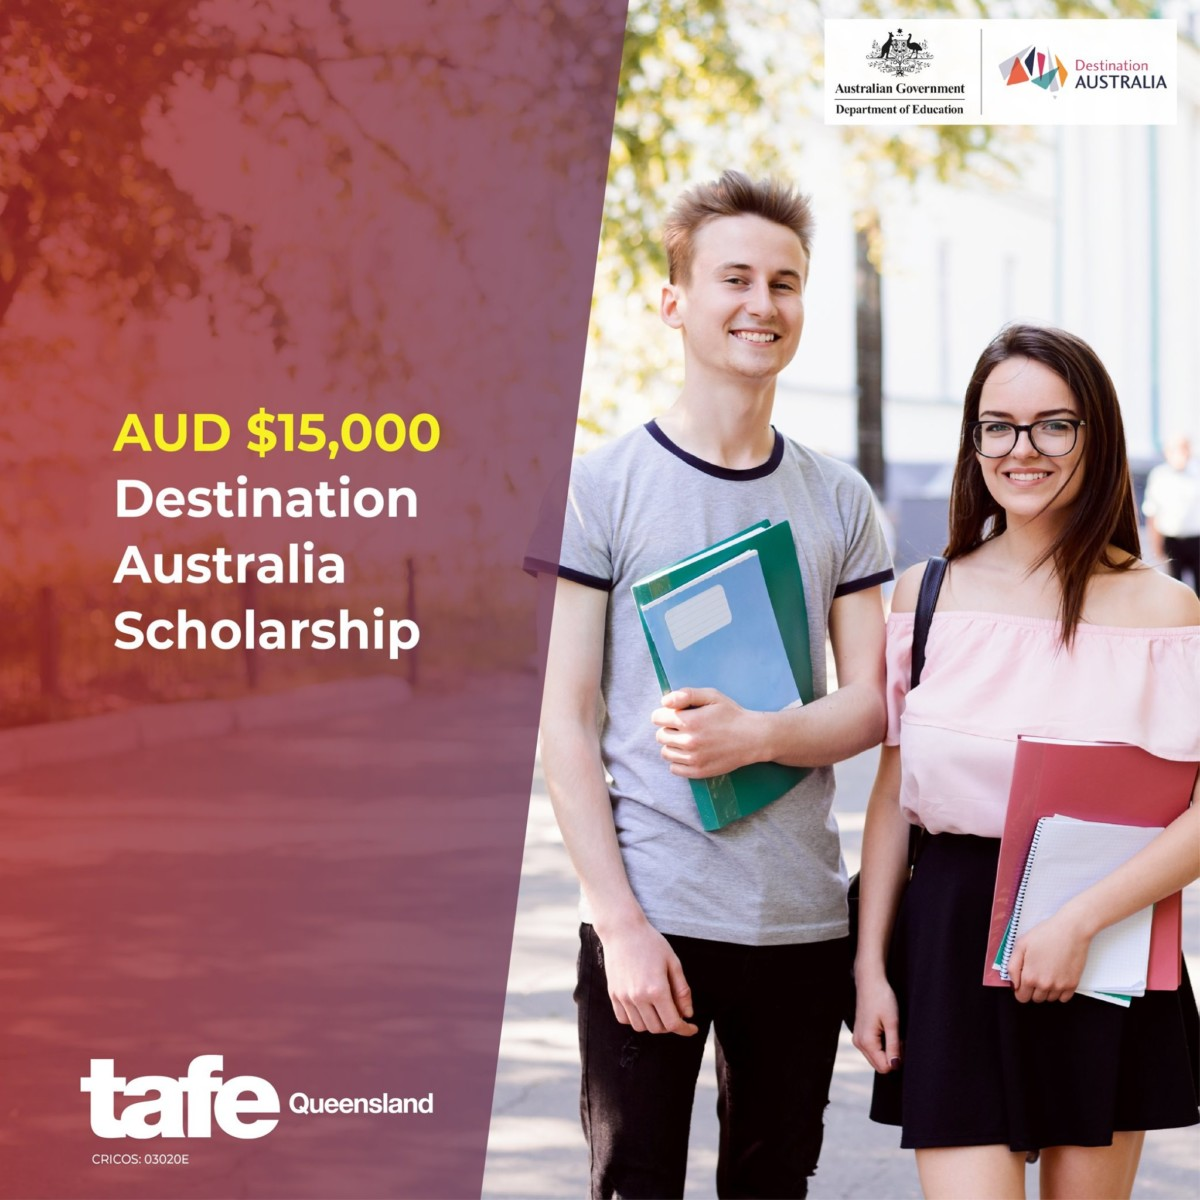 Destination Australia Scholarships